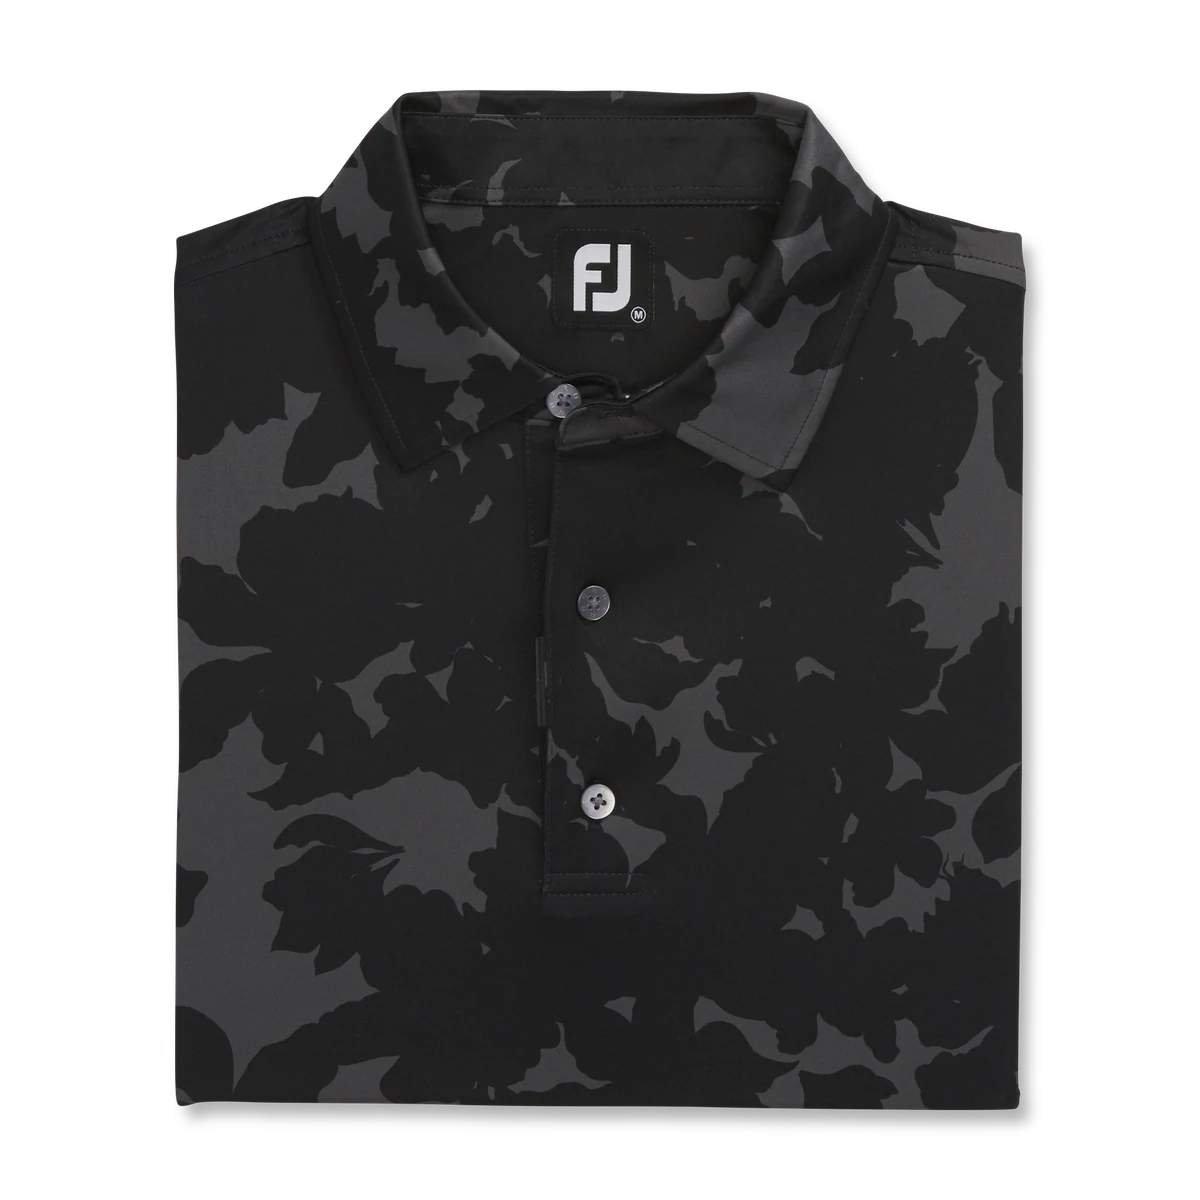 FootJoy Men's Lisle Camo Floral Black Polo